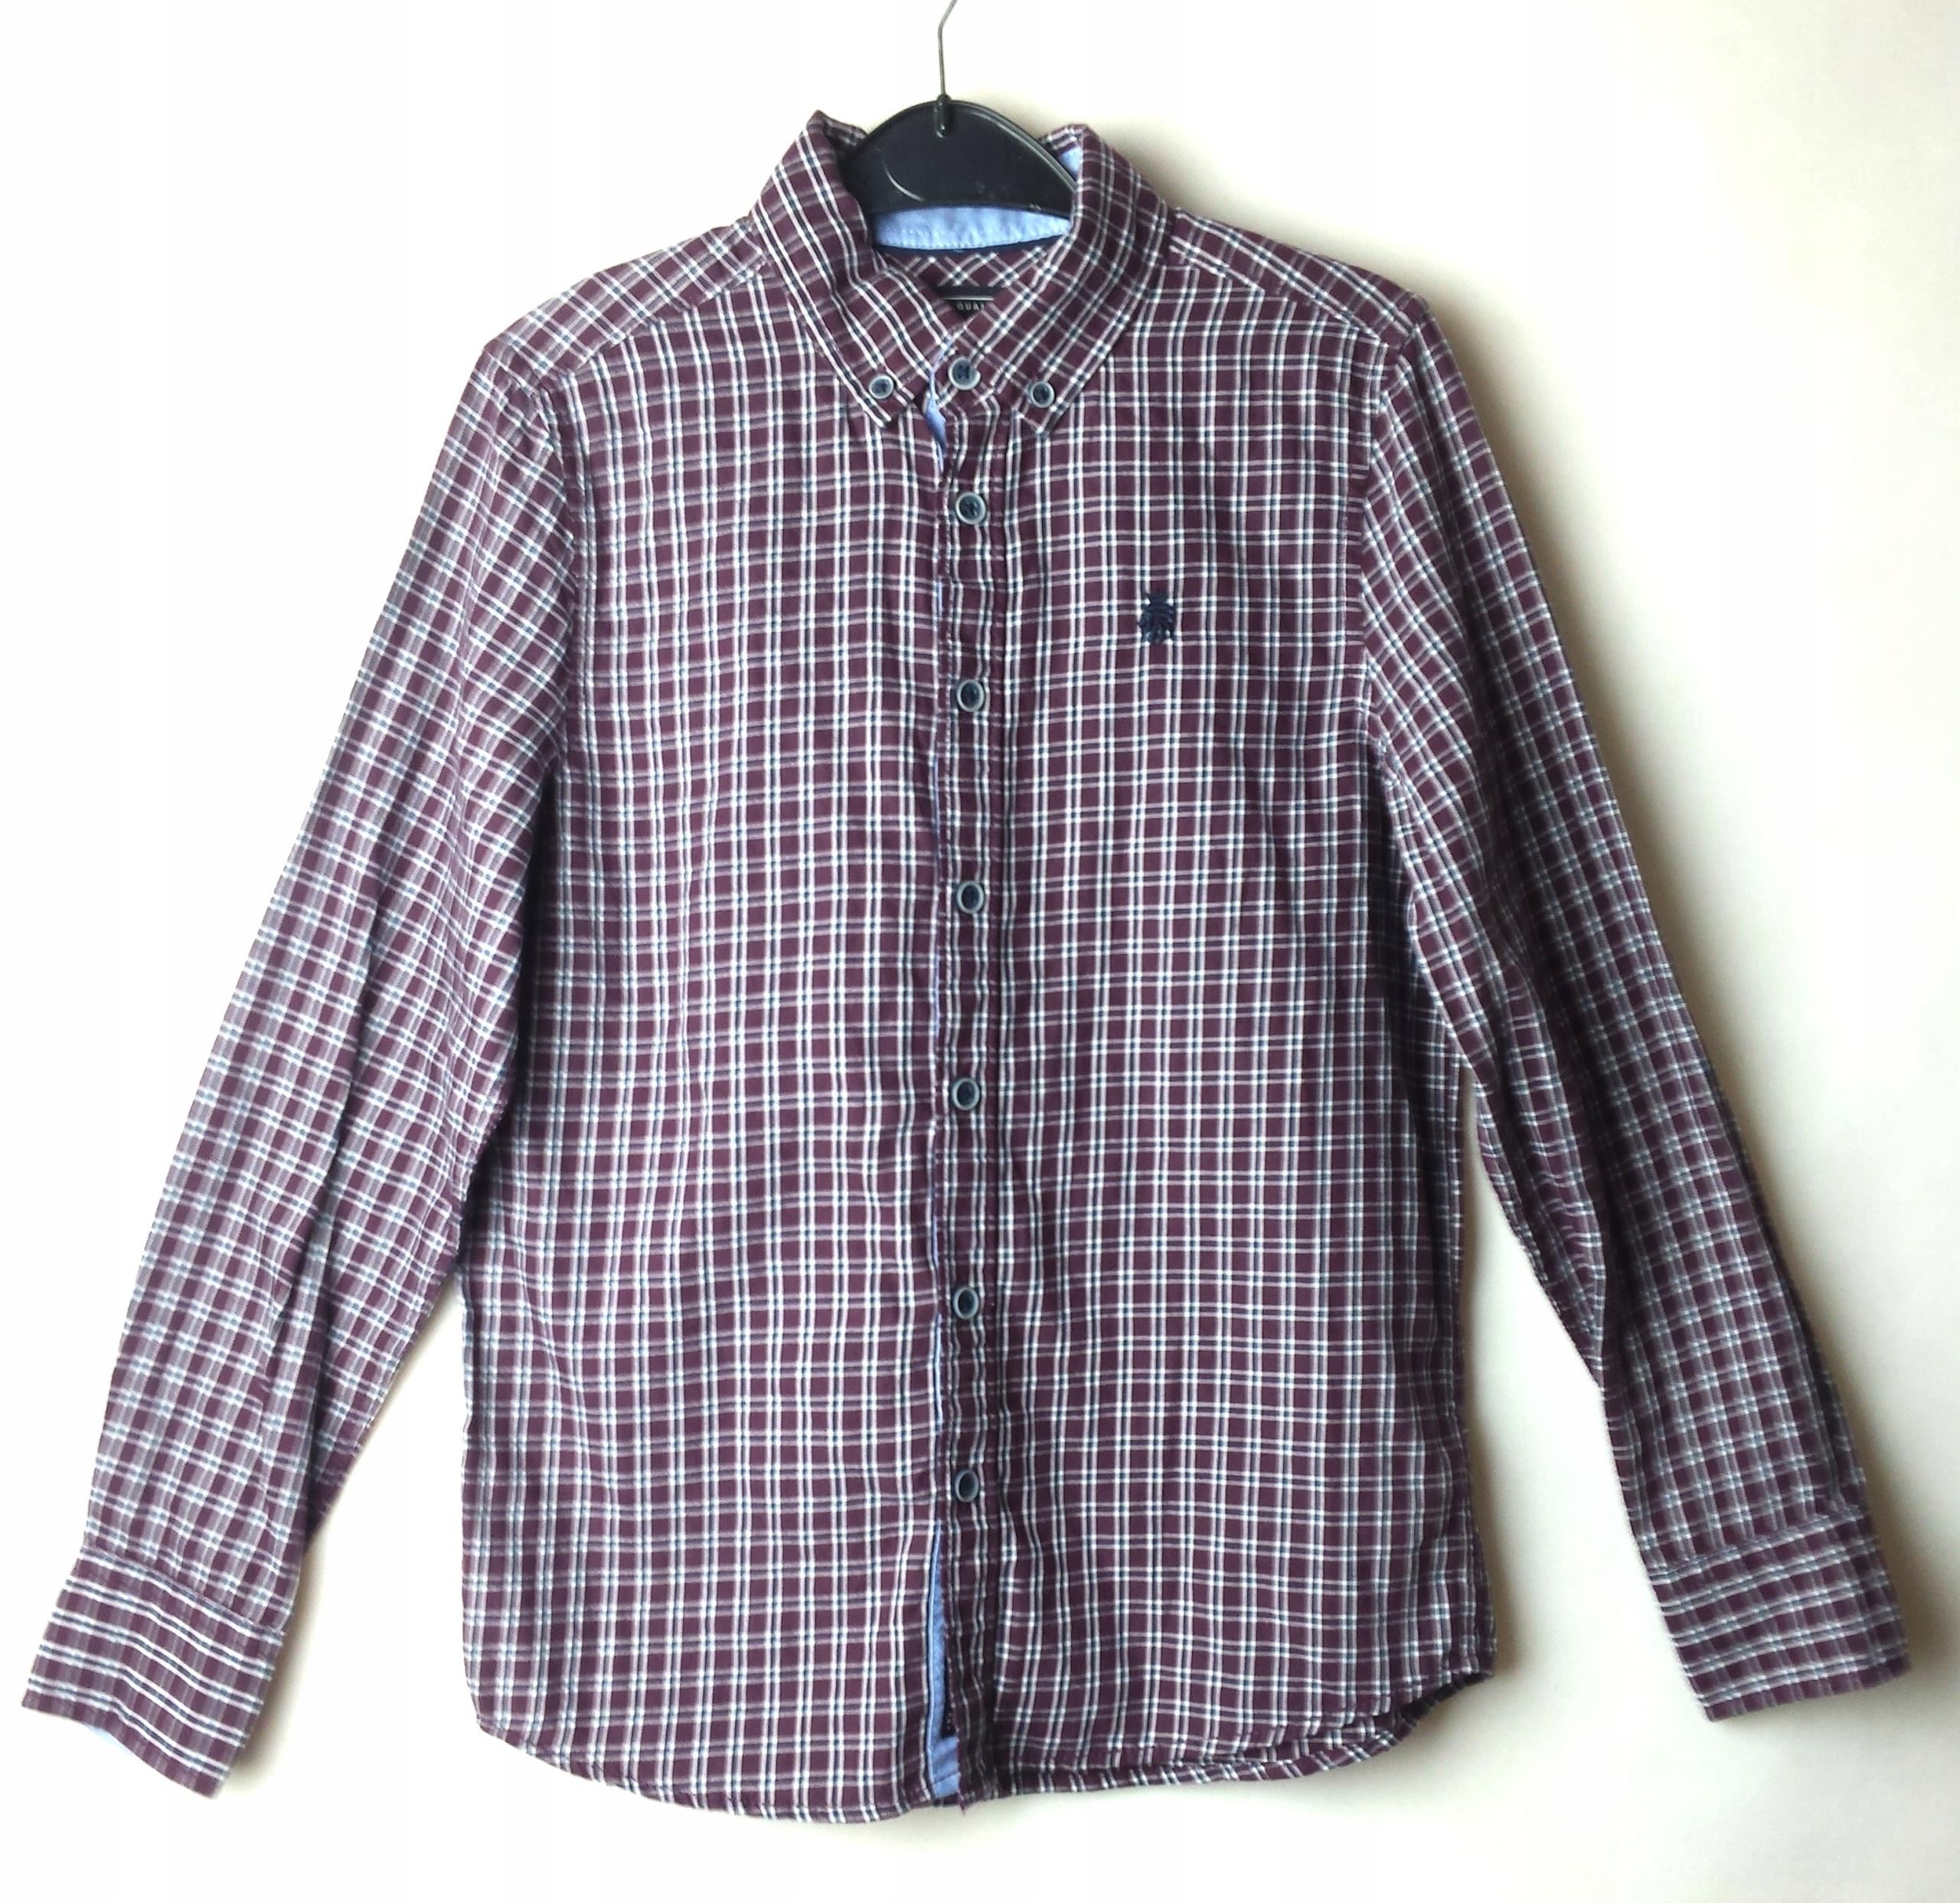 Dunnes XS S koszula w kratę czarna szara krata w Koszule